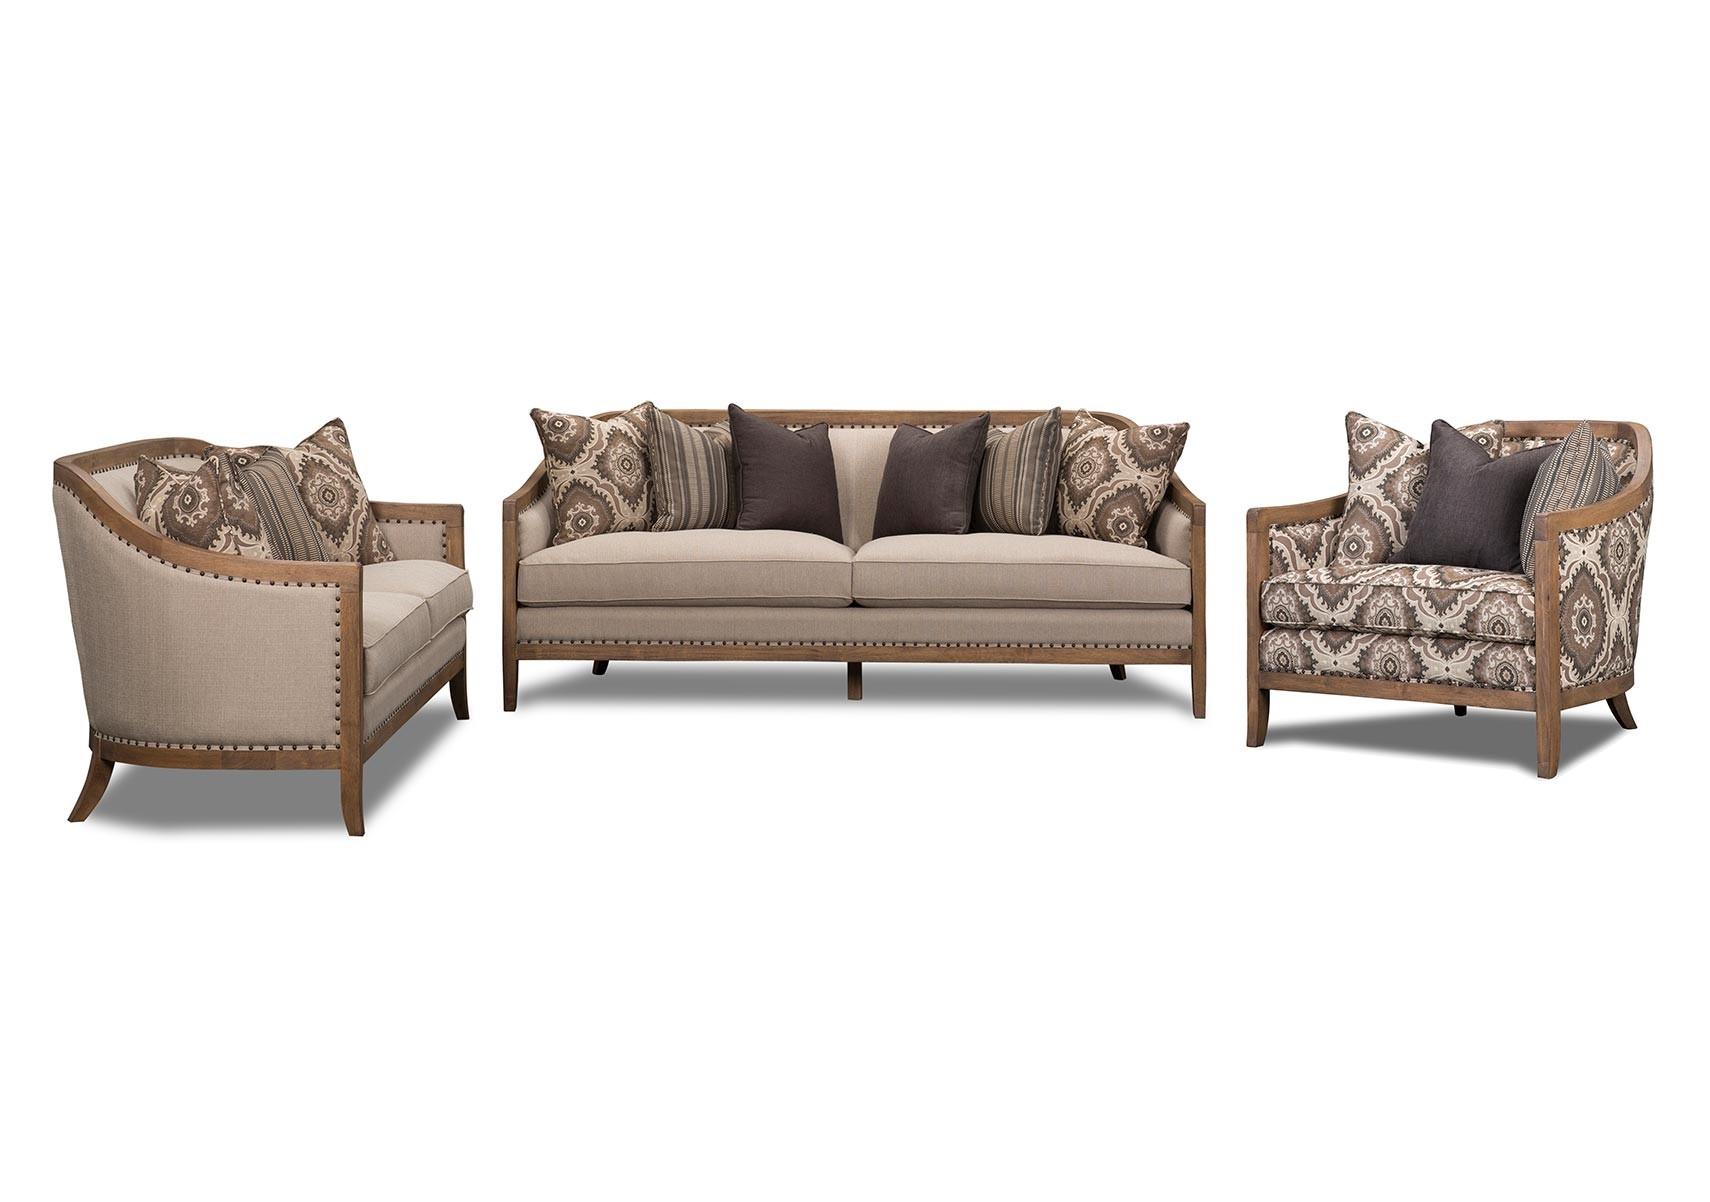 Lacks | Colburn 3-Pc Living Room Set